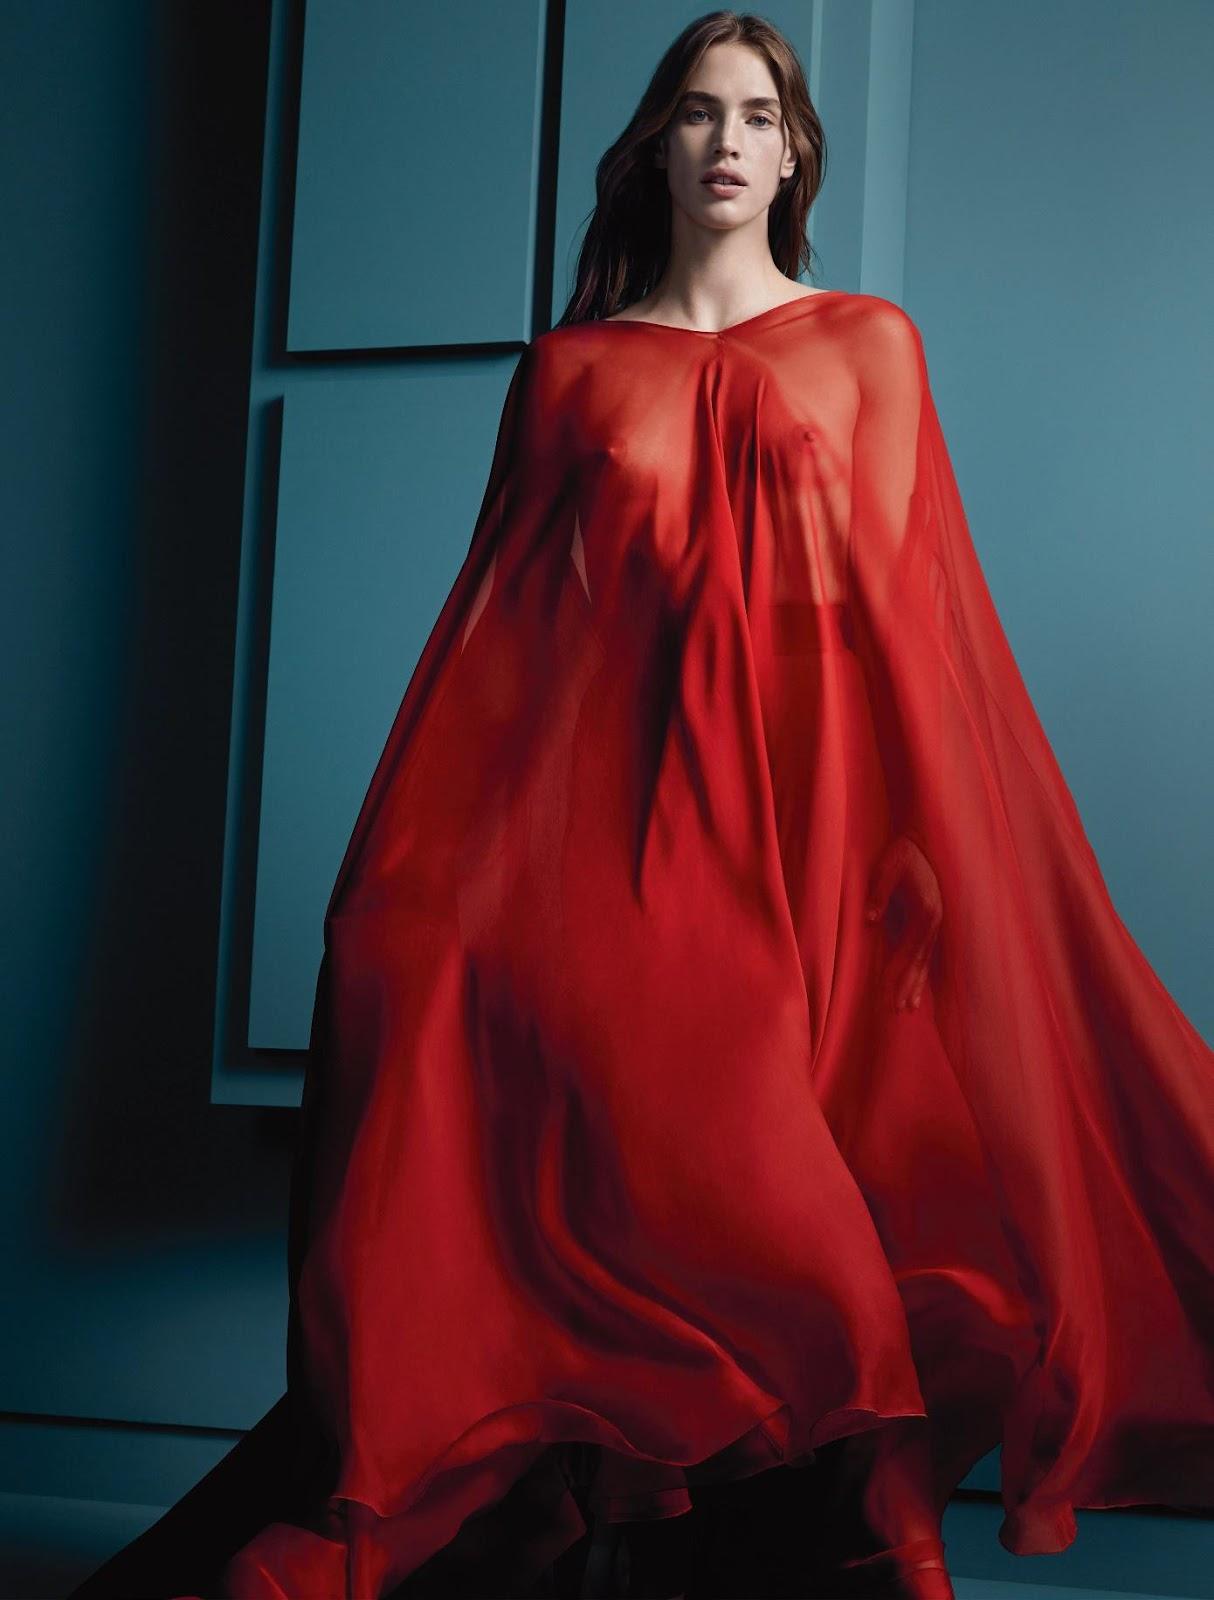 Crista cober numero magazine aug 2015 by txema yeste hq photo shoot new images